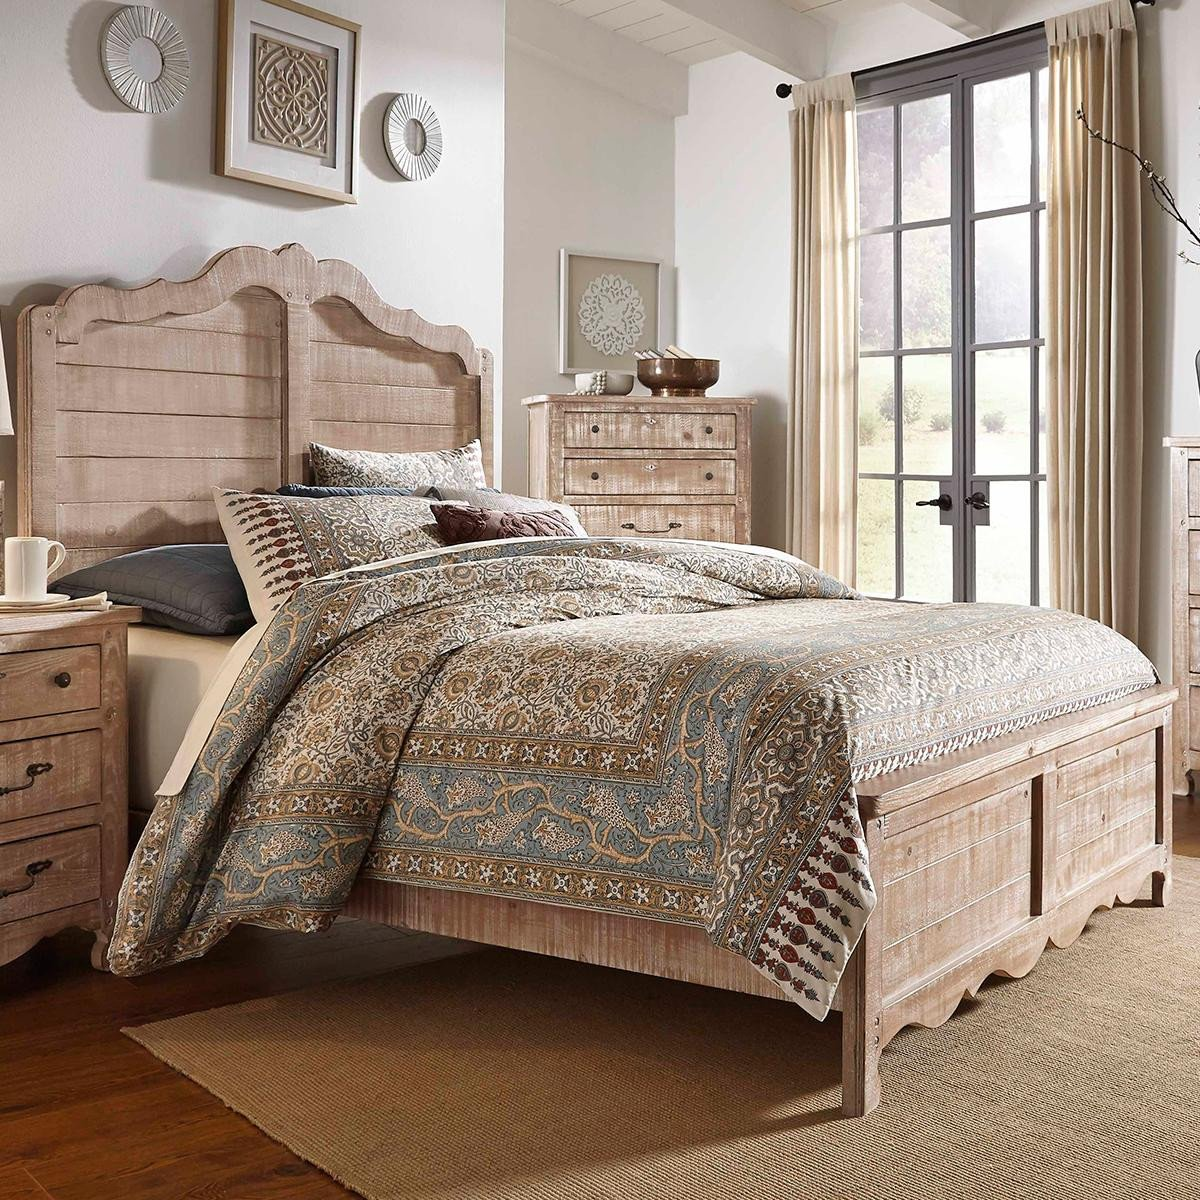 Nebraska Furniture Bedroom Set Luxury Tiddal Home Chatsworth King Panel Bed In Chalk Distressed